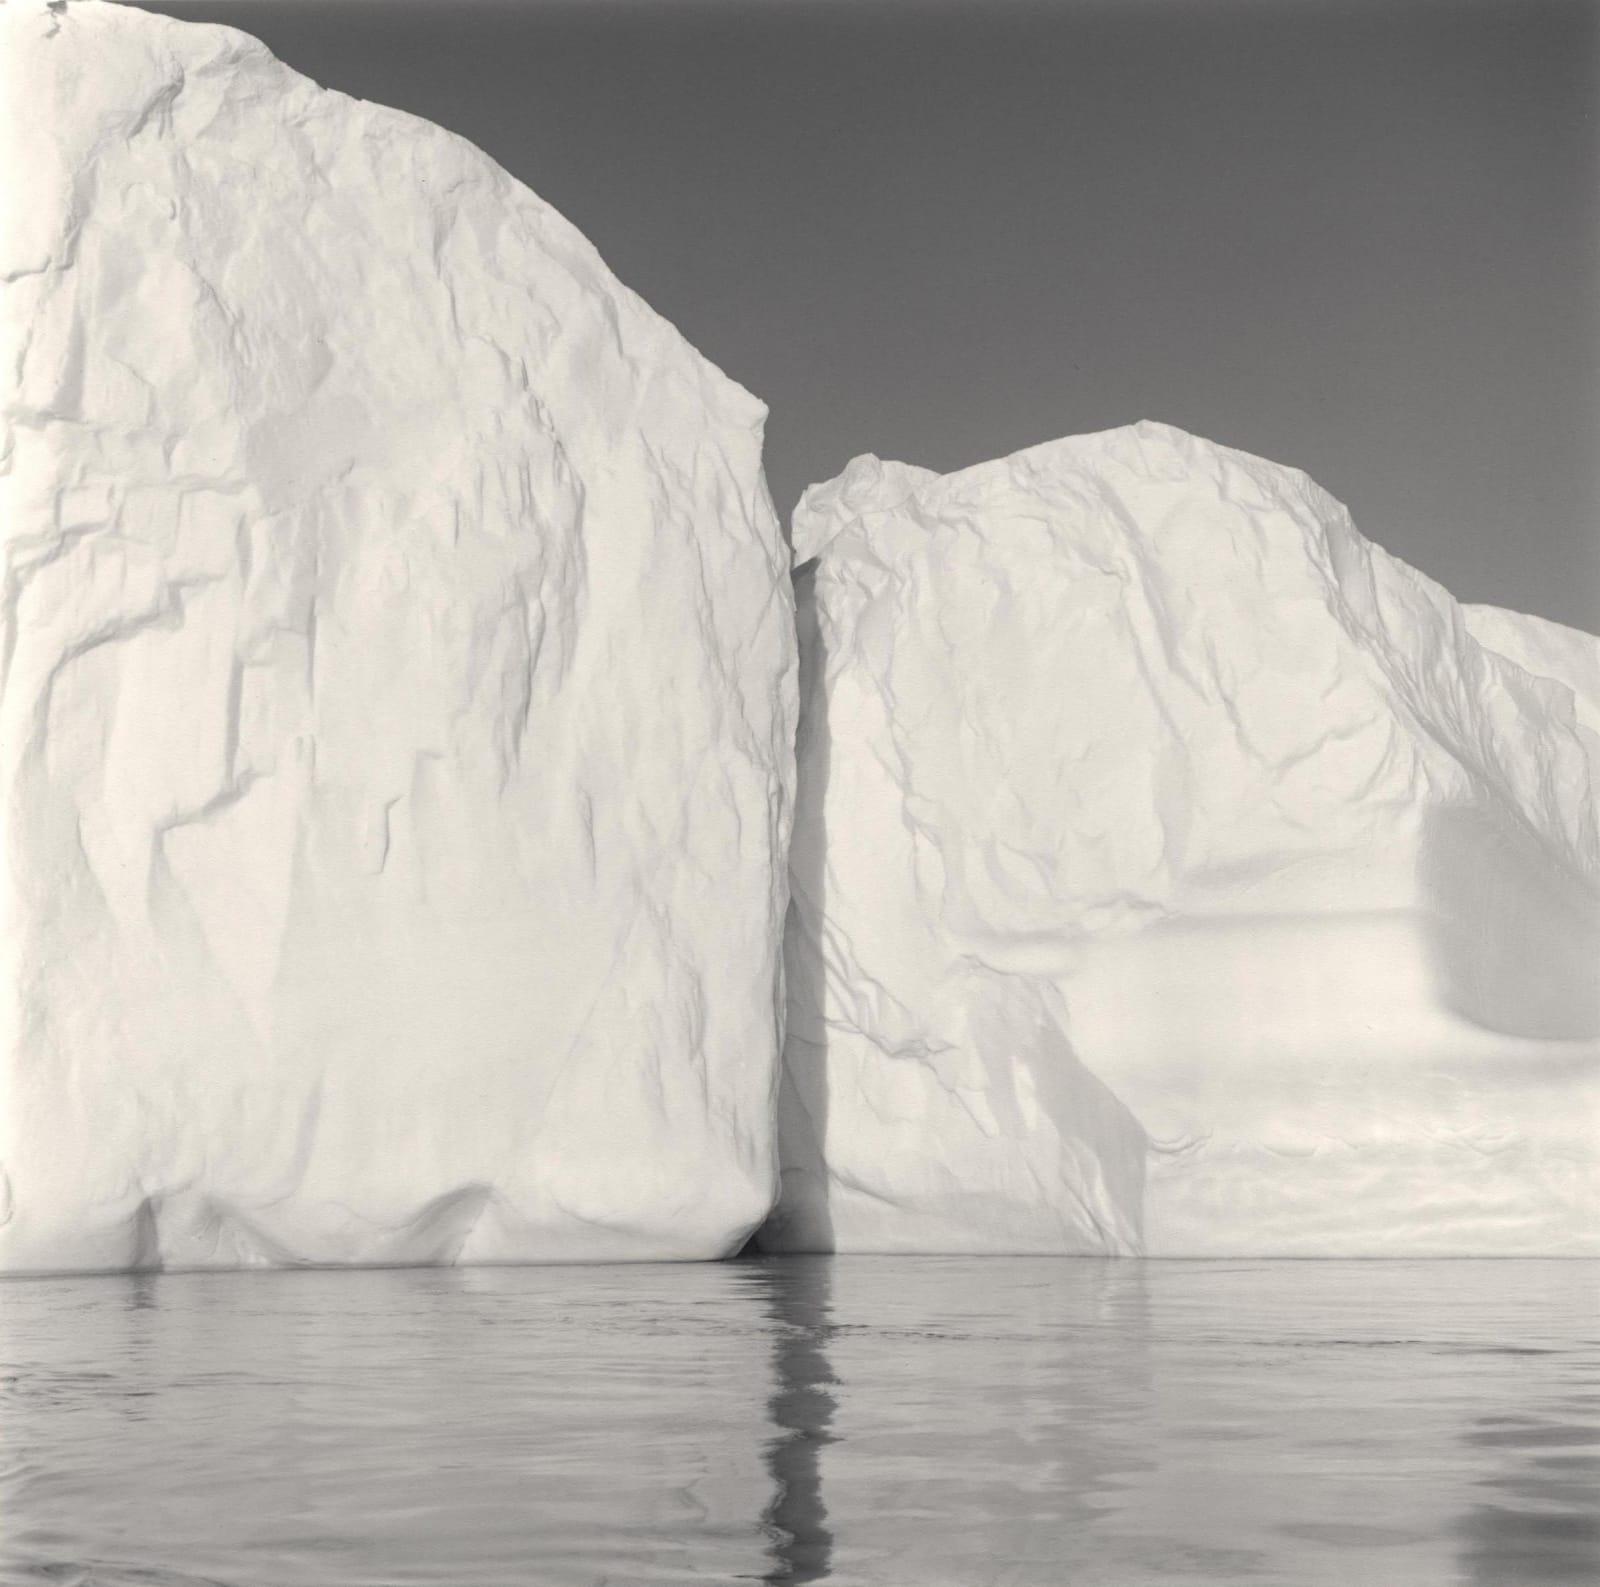 Two geometric icebergs touching in Disko Bay, Greenland by Lynn Davis